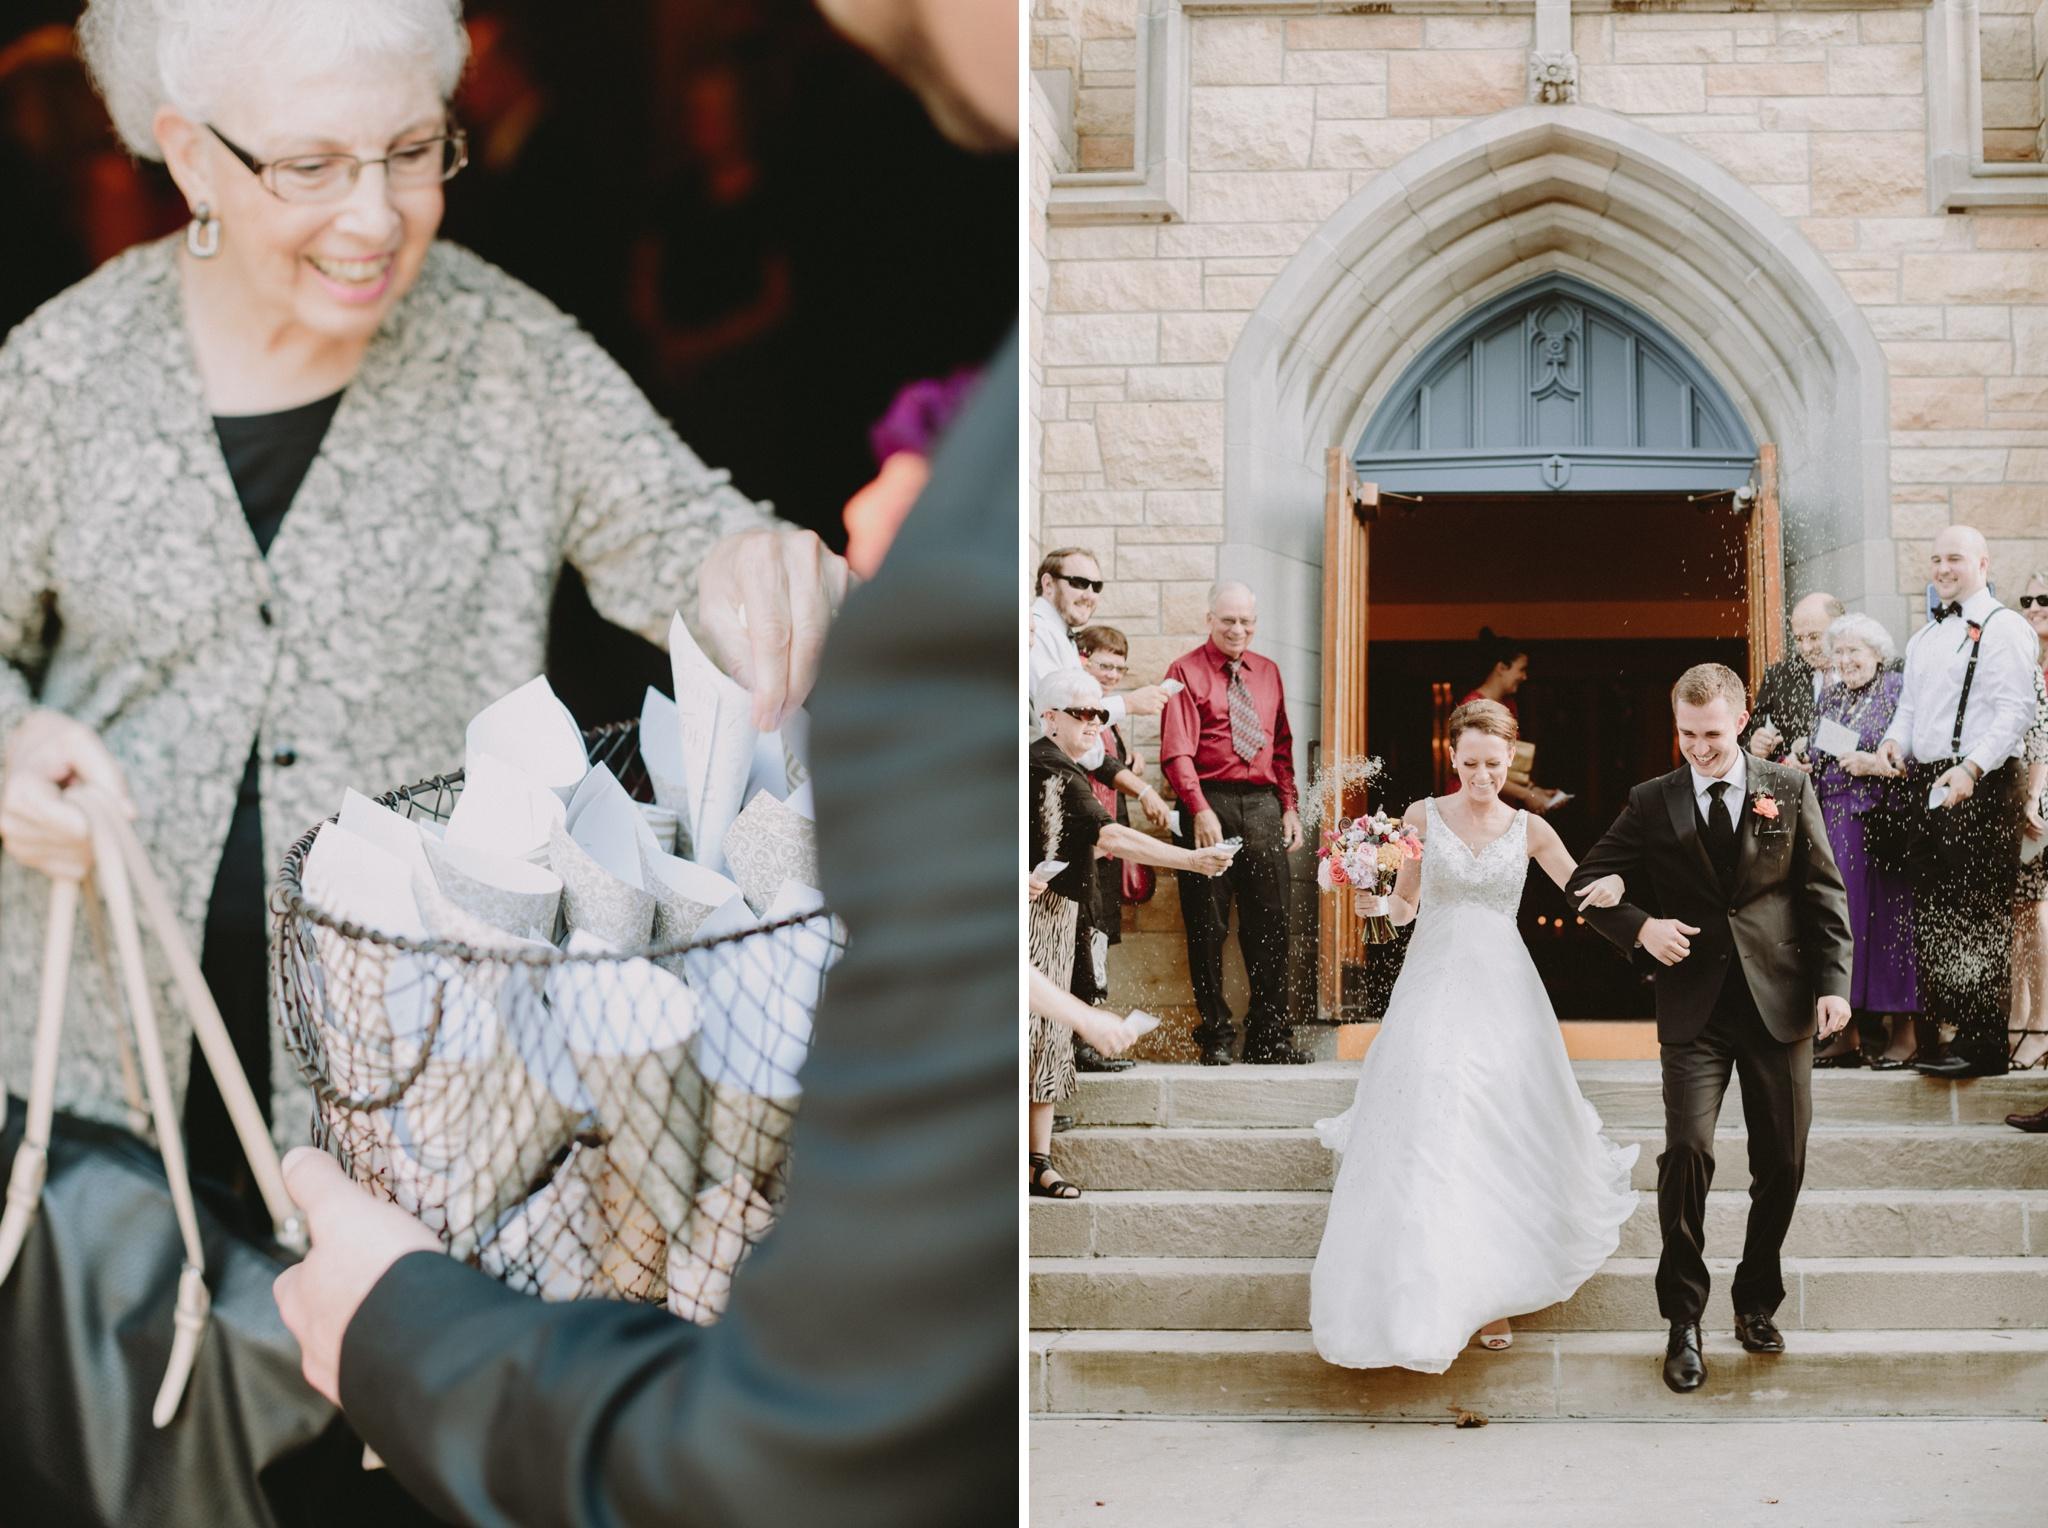 grand-exit-iowa-venue-fort-dodge-church-ceremony-first-presbyterian-bird-seed